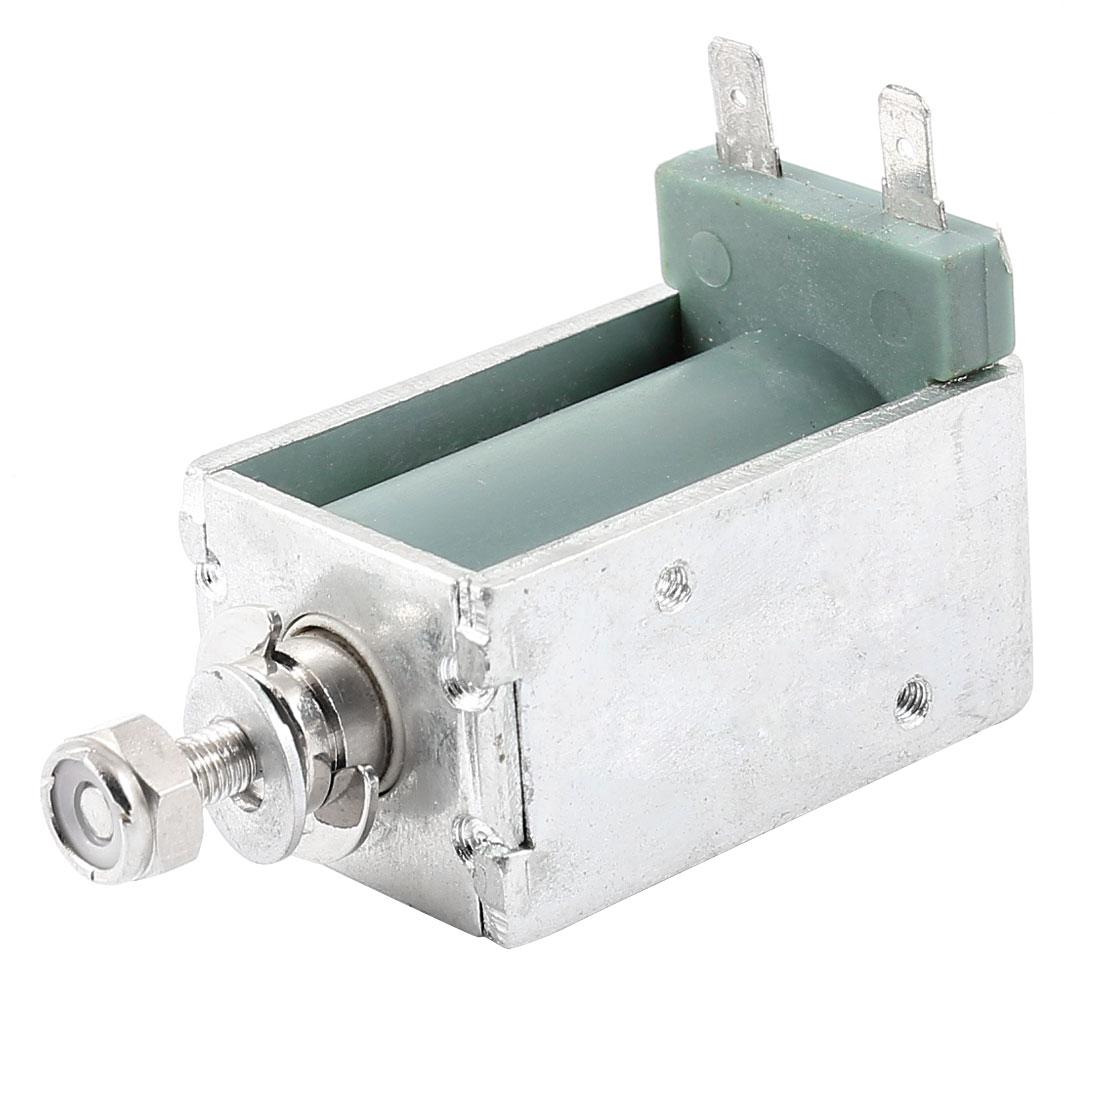 2mm/5Kg 12mm/0.8Kg 146.6W Power Open Frame Pull Type Solenoid Electromagnet 220V 0.66A